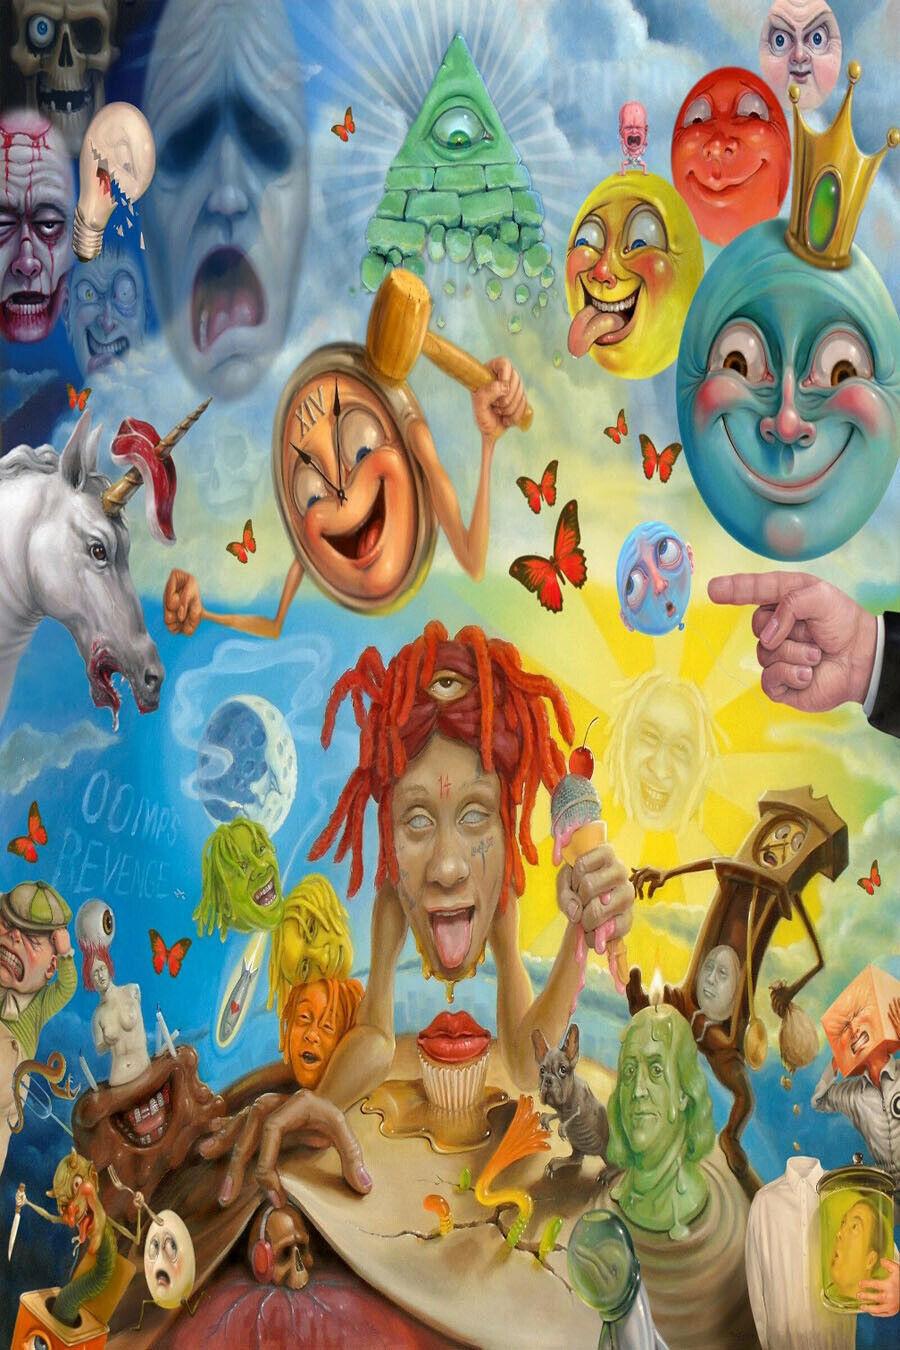 Trippie Redd Rap Hip Hop Rapper Music Art New Print 27x40 24x36 Poster C-368